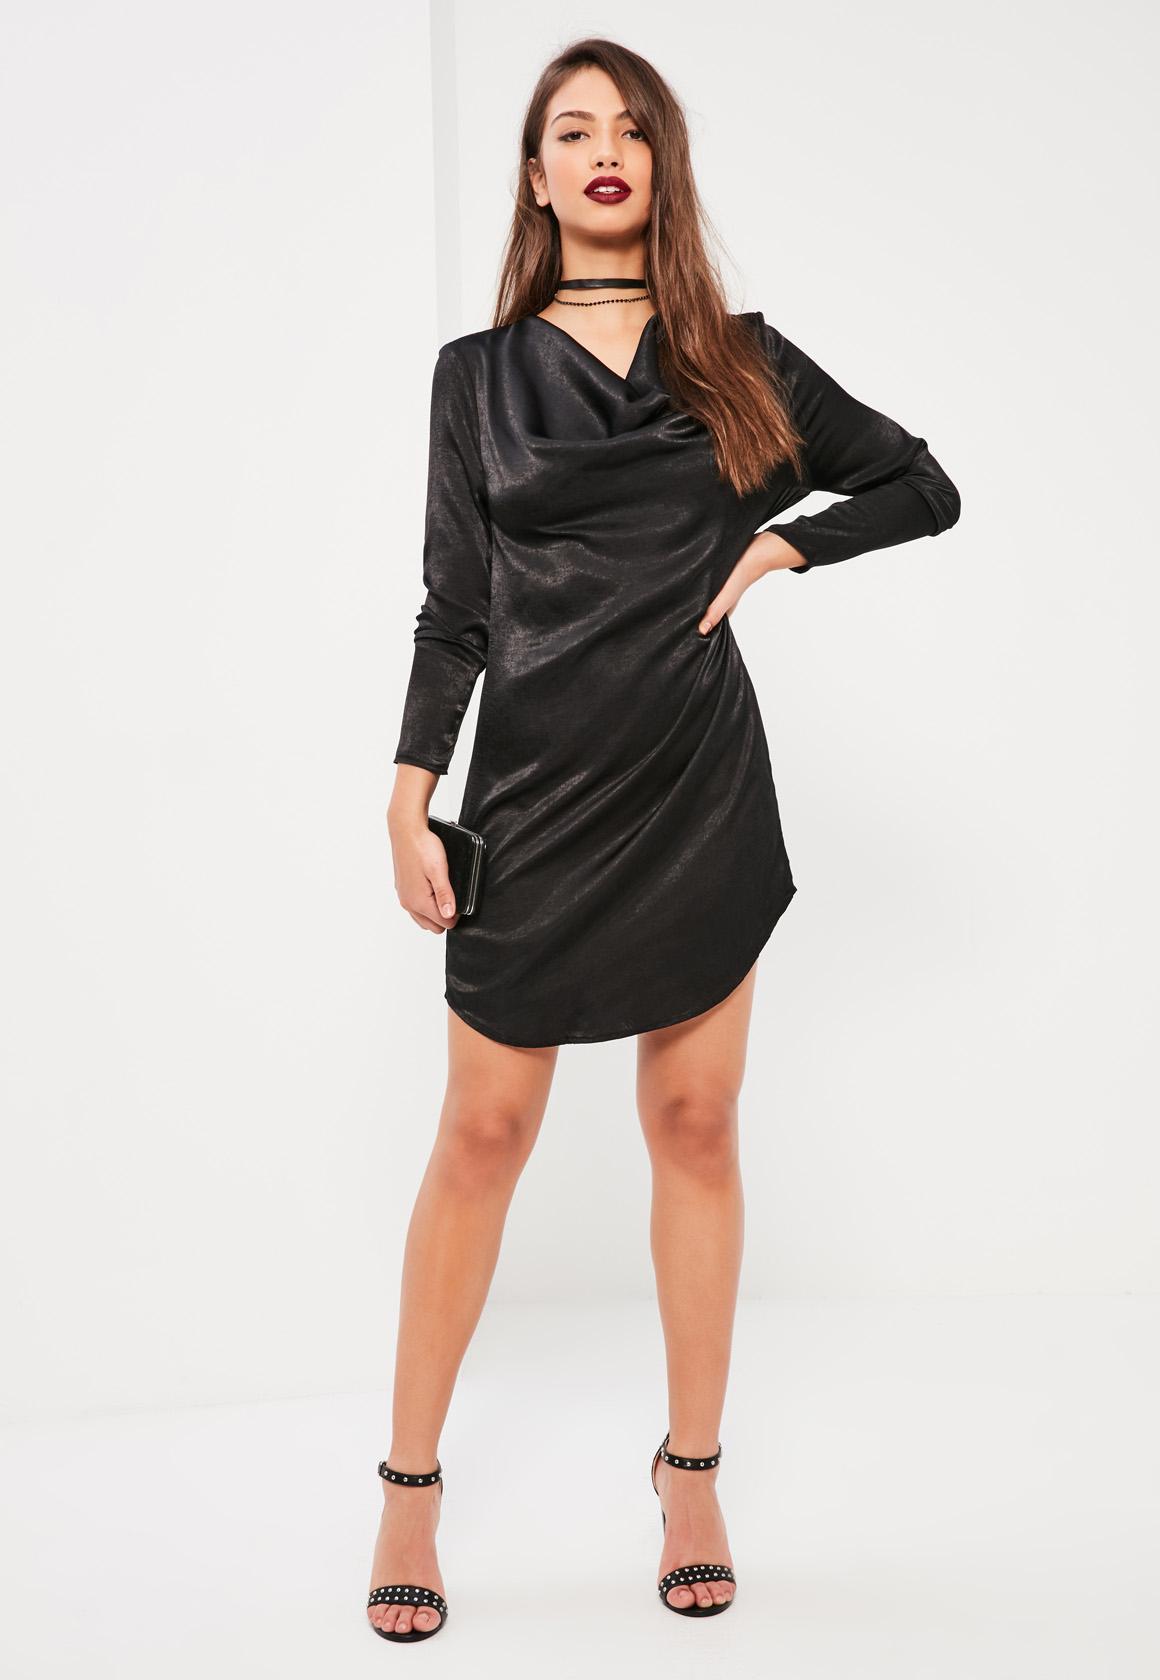 Black Cowl Neck Satin Dress